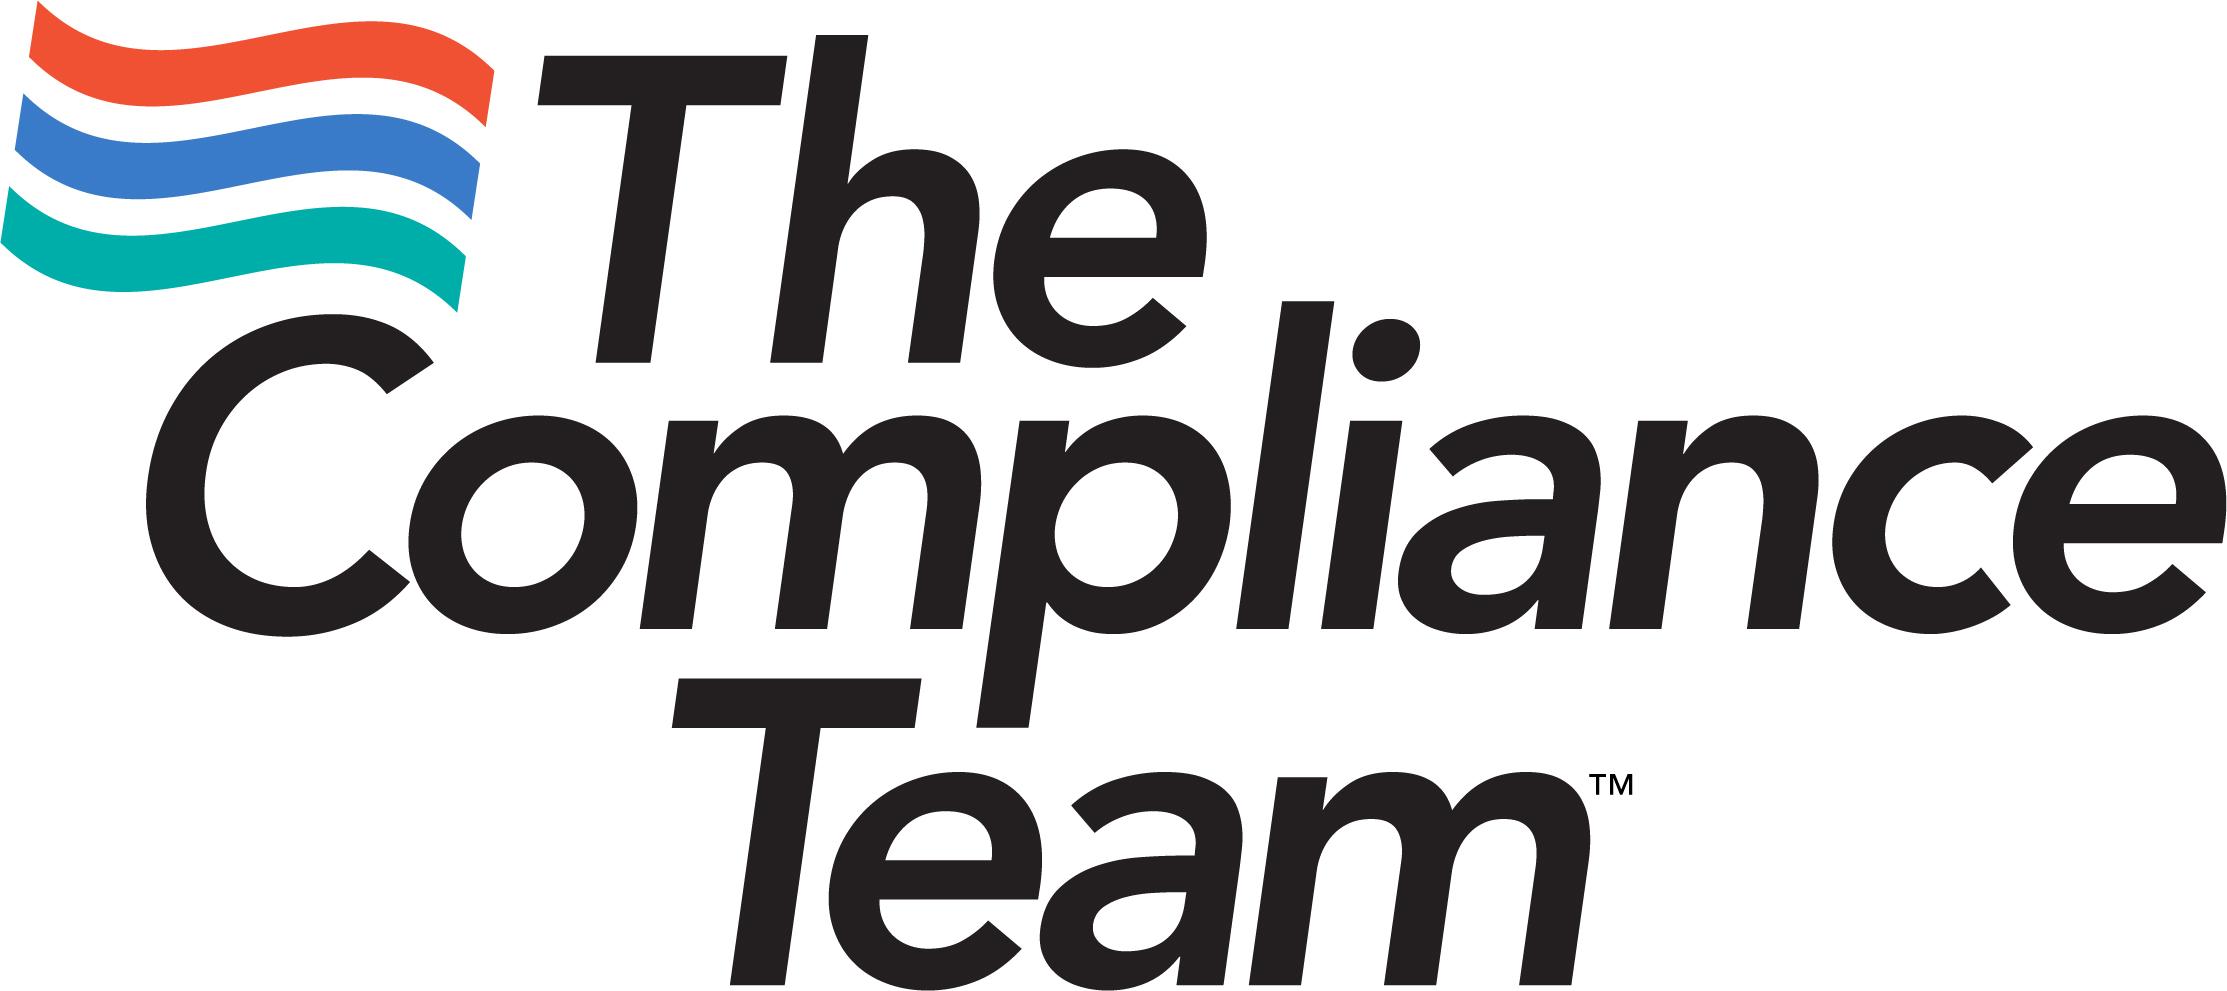 TCT_Logo_AvenirHeavy_Vertical[8]